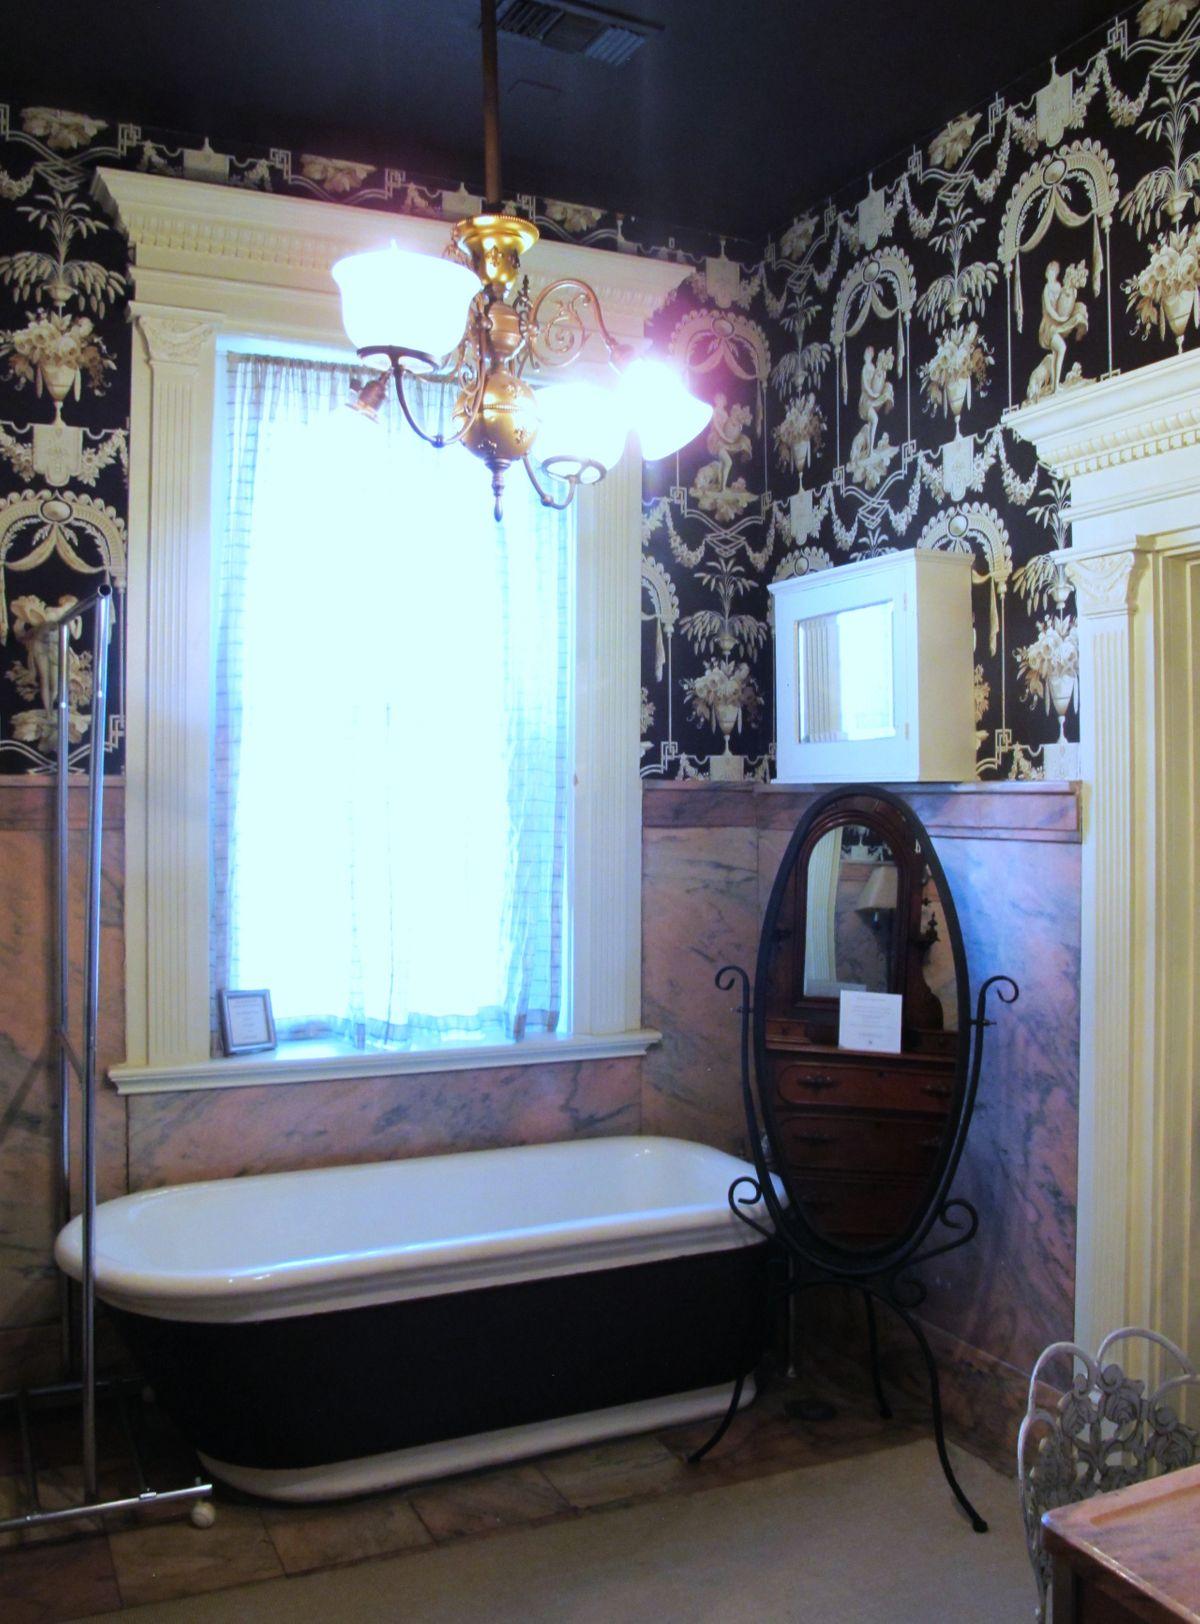 McFarland Historical Home Photo Video Shoot Location Dallas 13.jpg